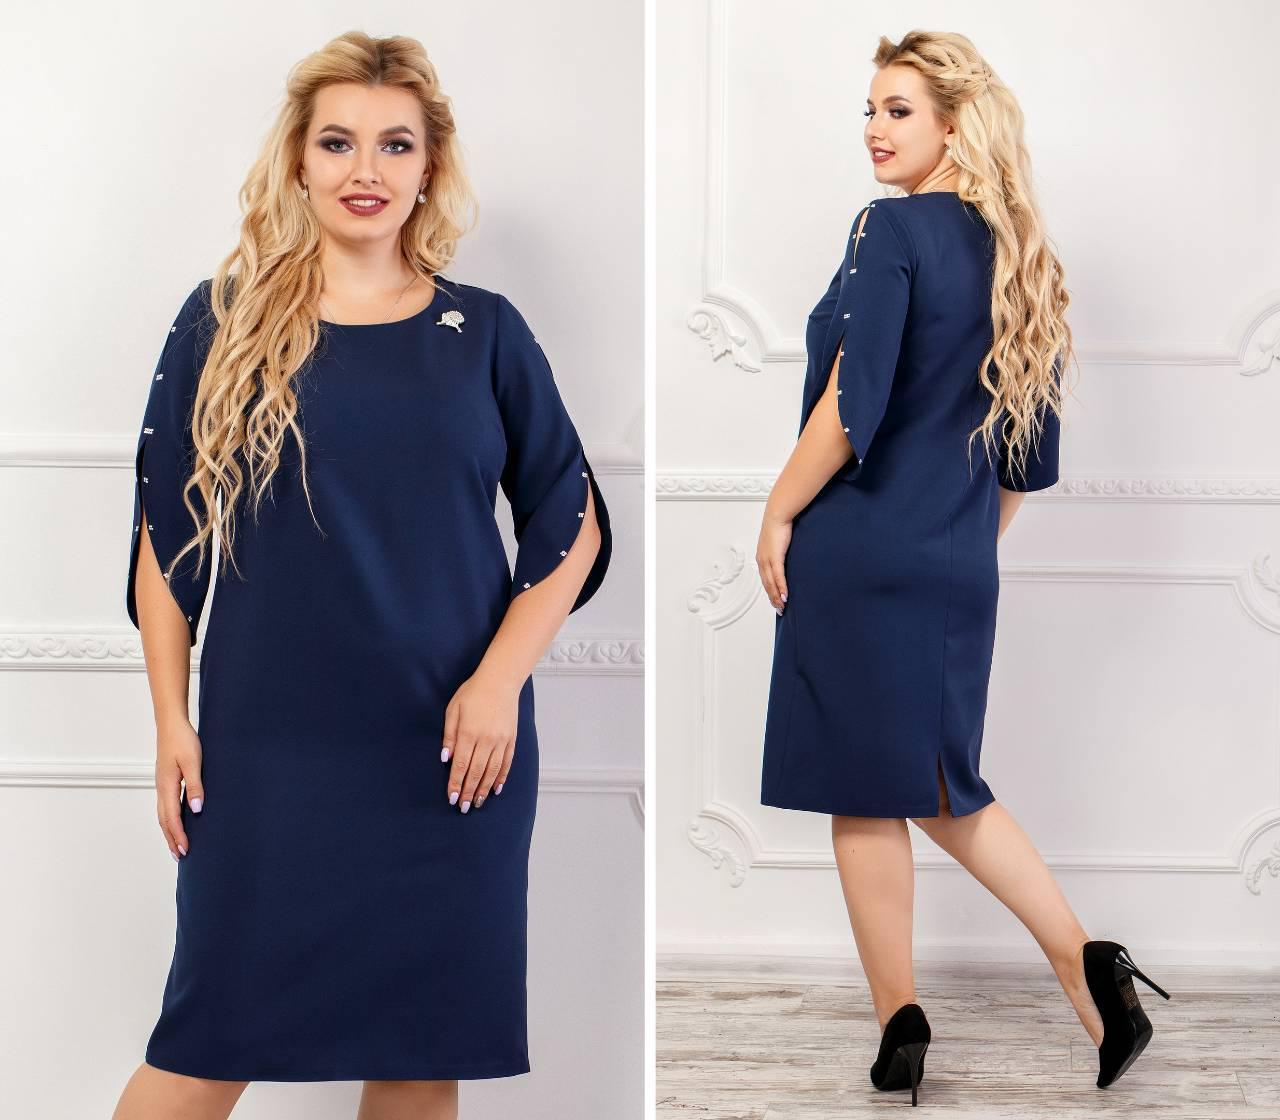 Новинка! Платье батал с брошью, модель 130 , цвет темно синий